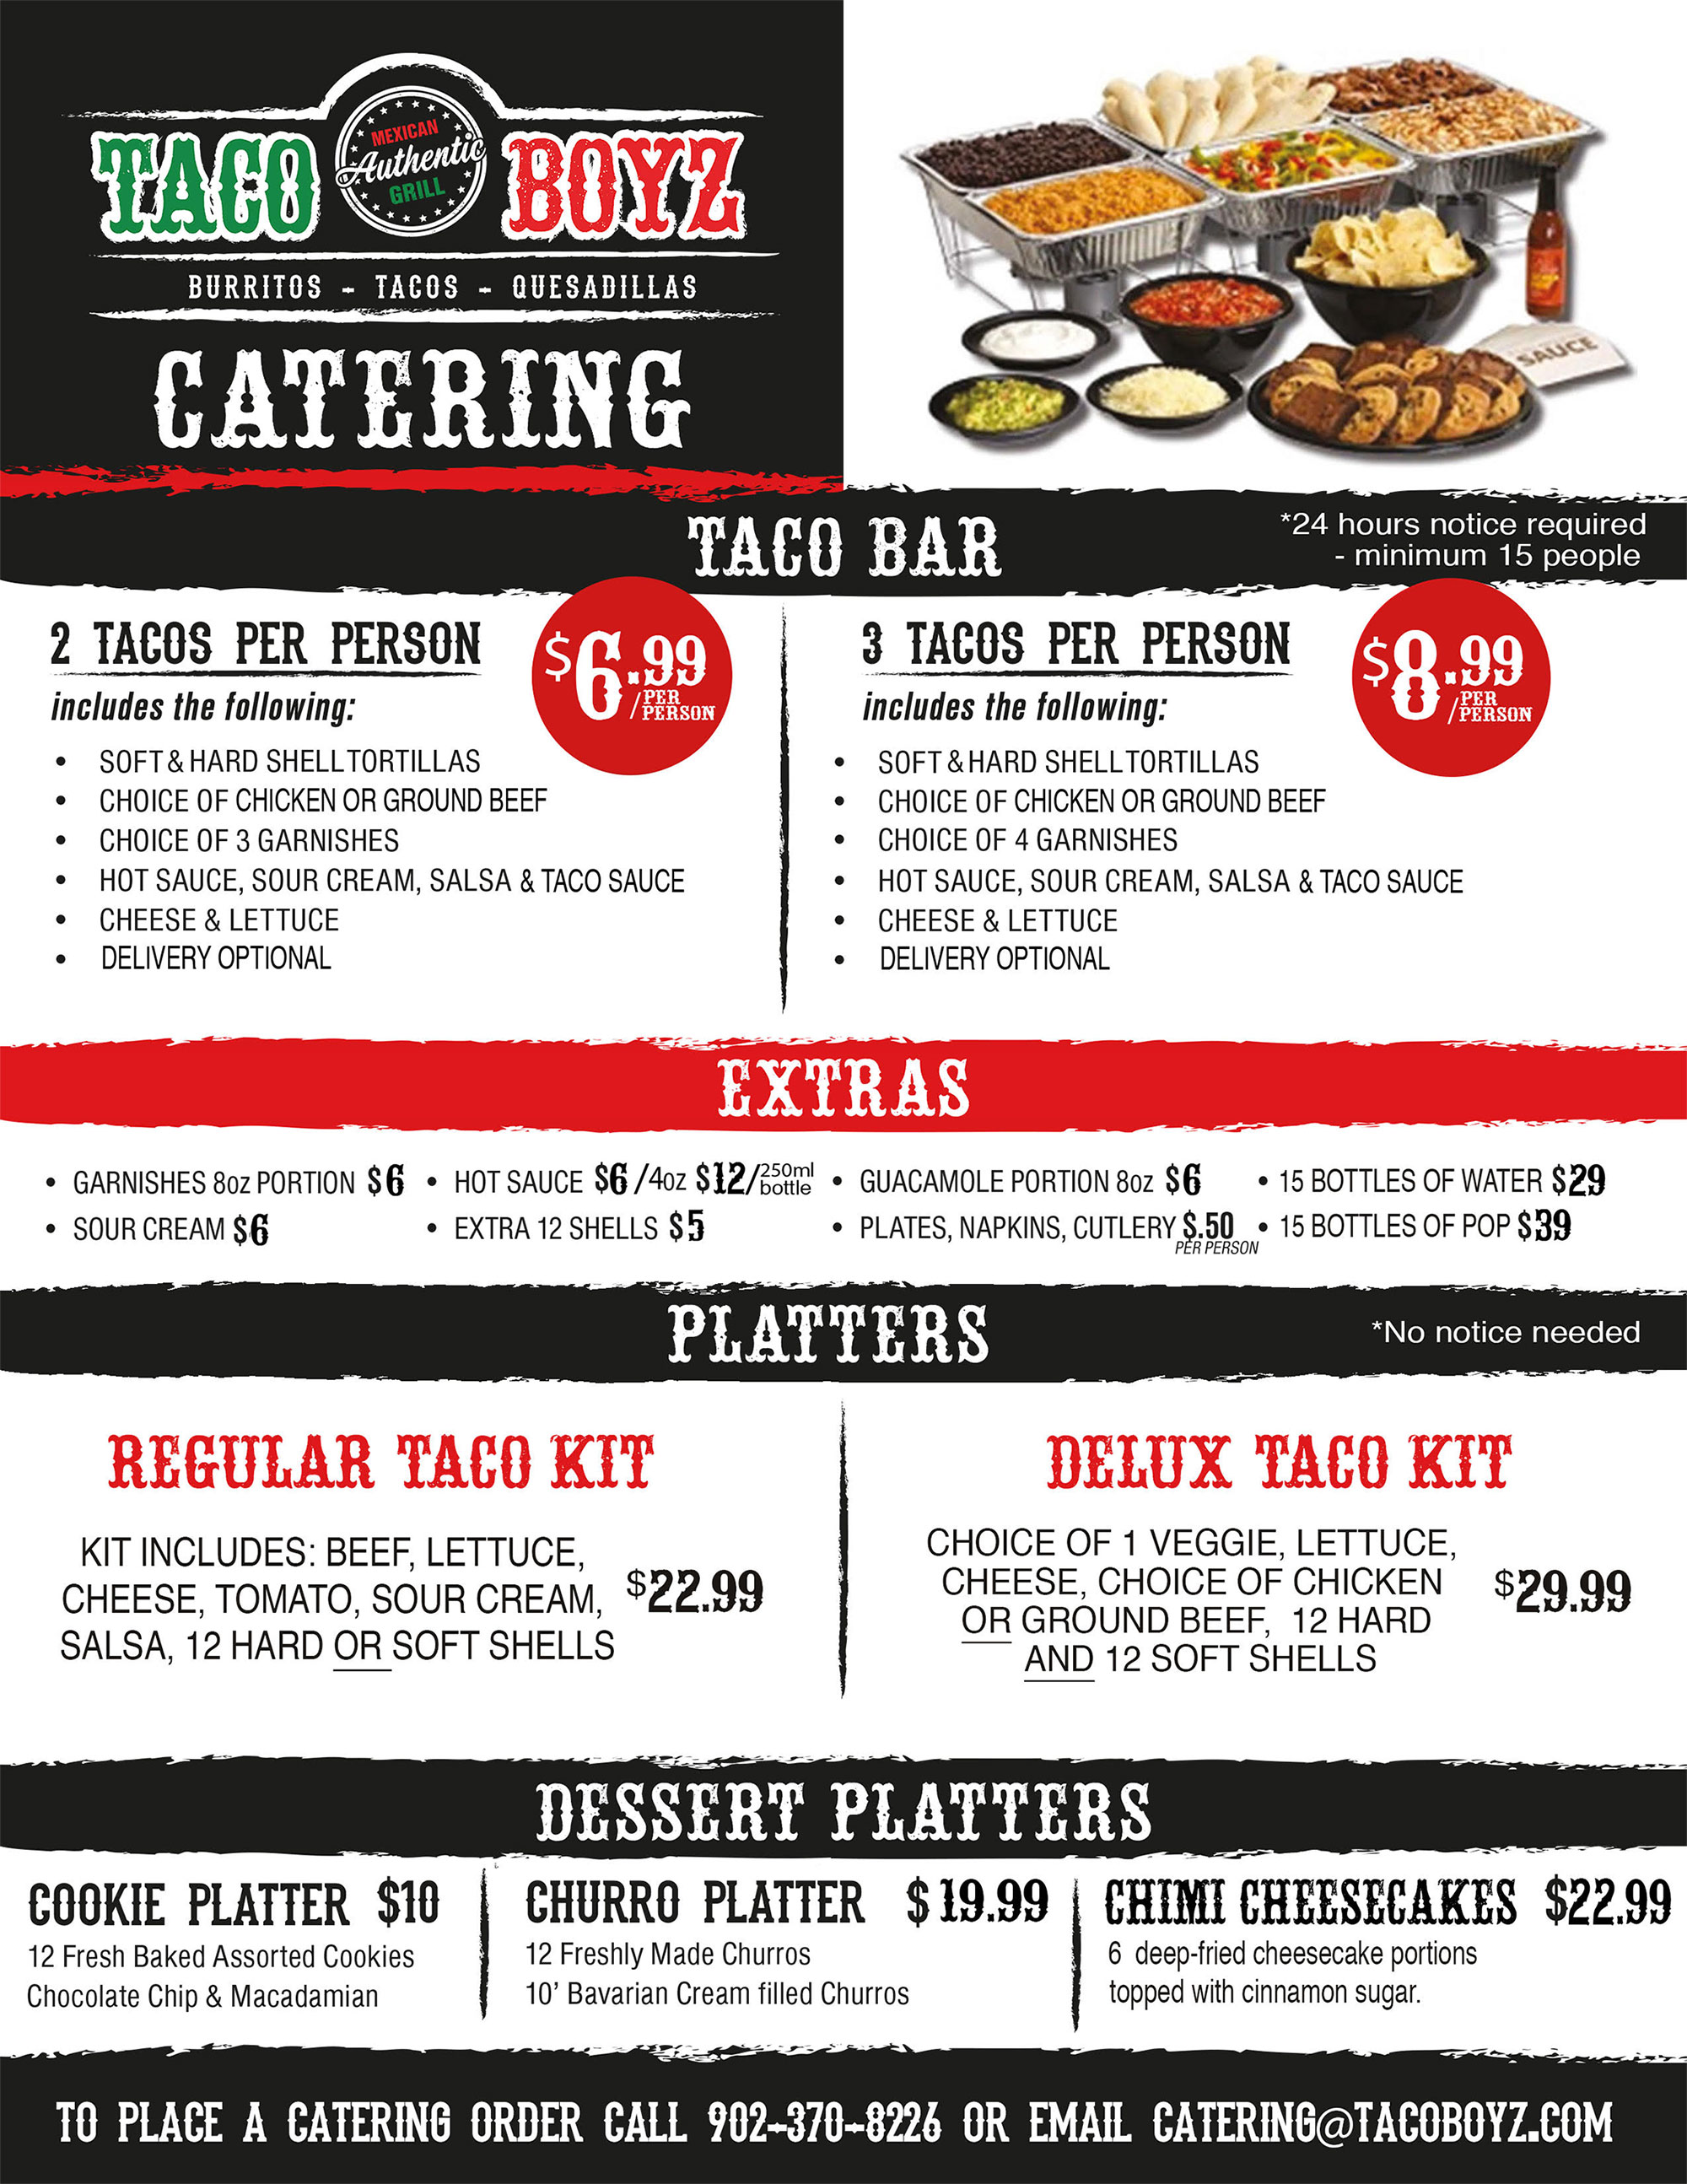 Catering – Taco Boyz